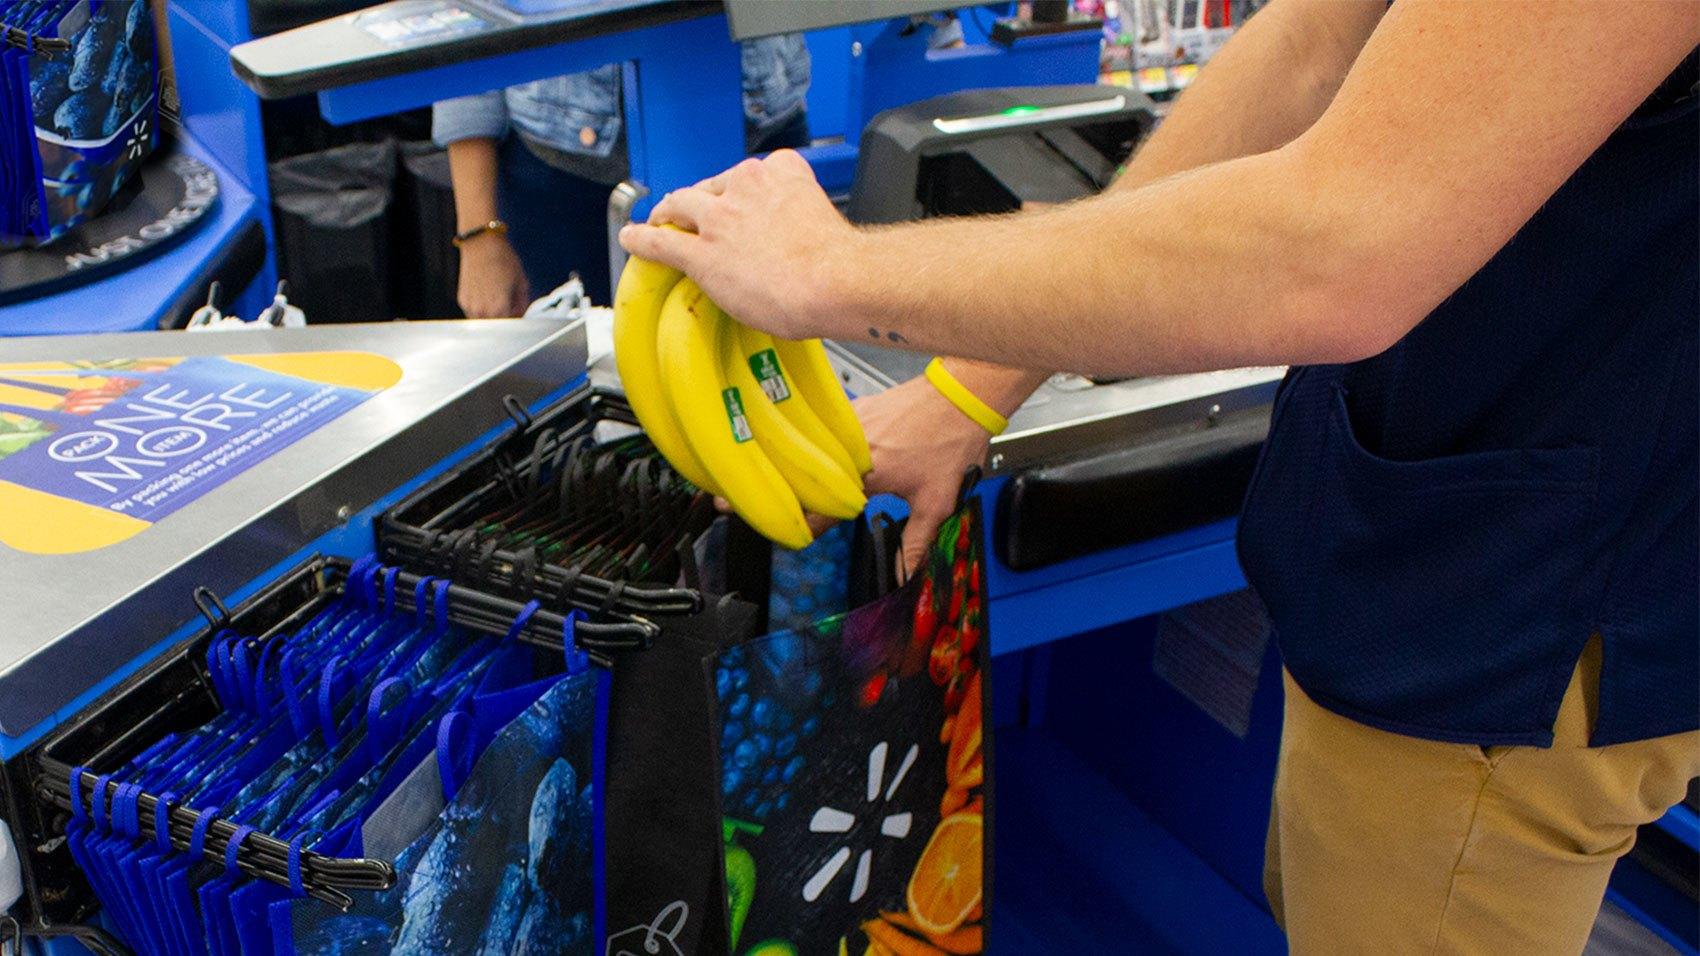 Plastics/checkout-bananas-bags.jpg